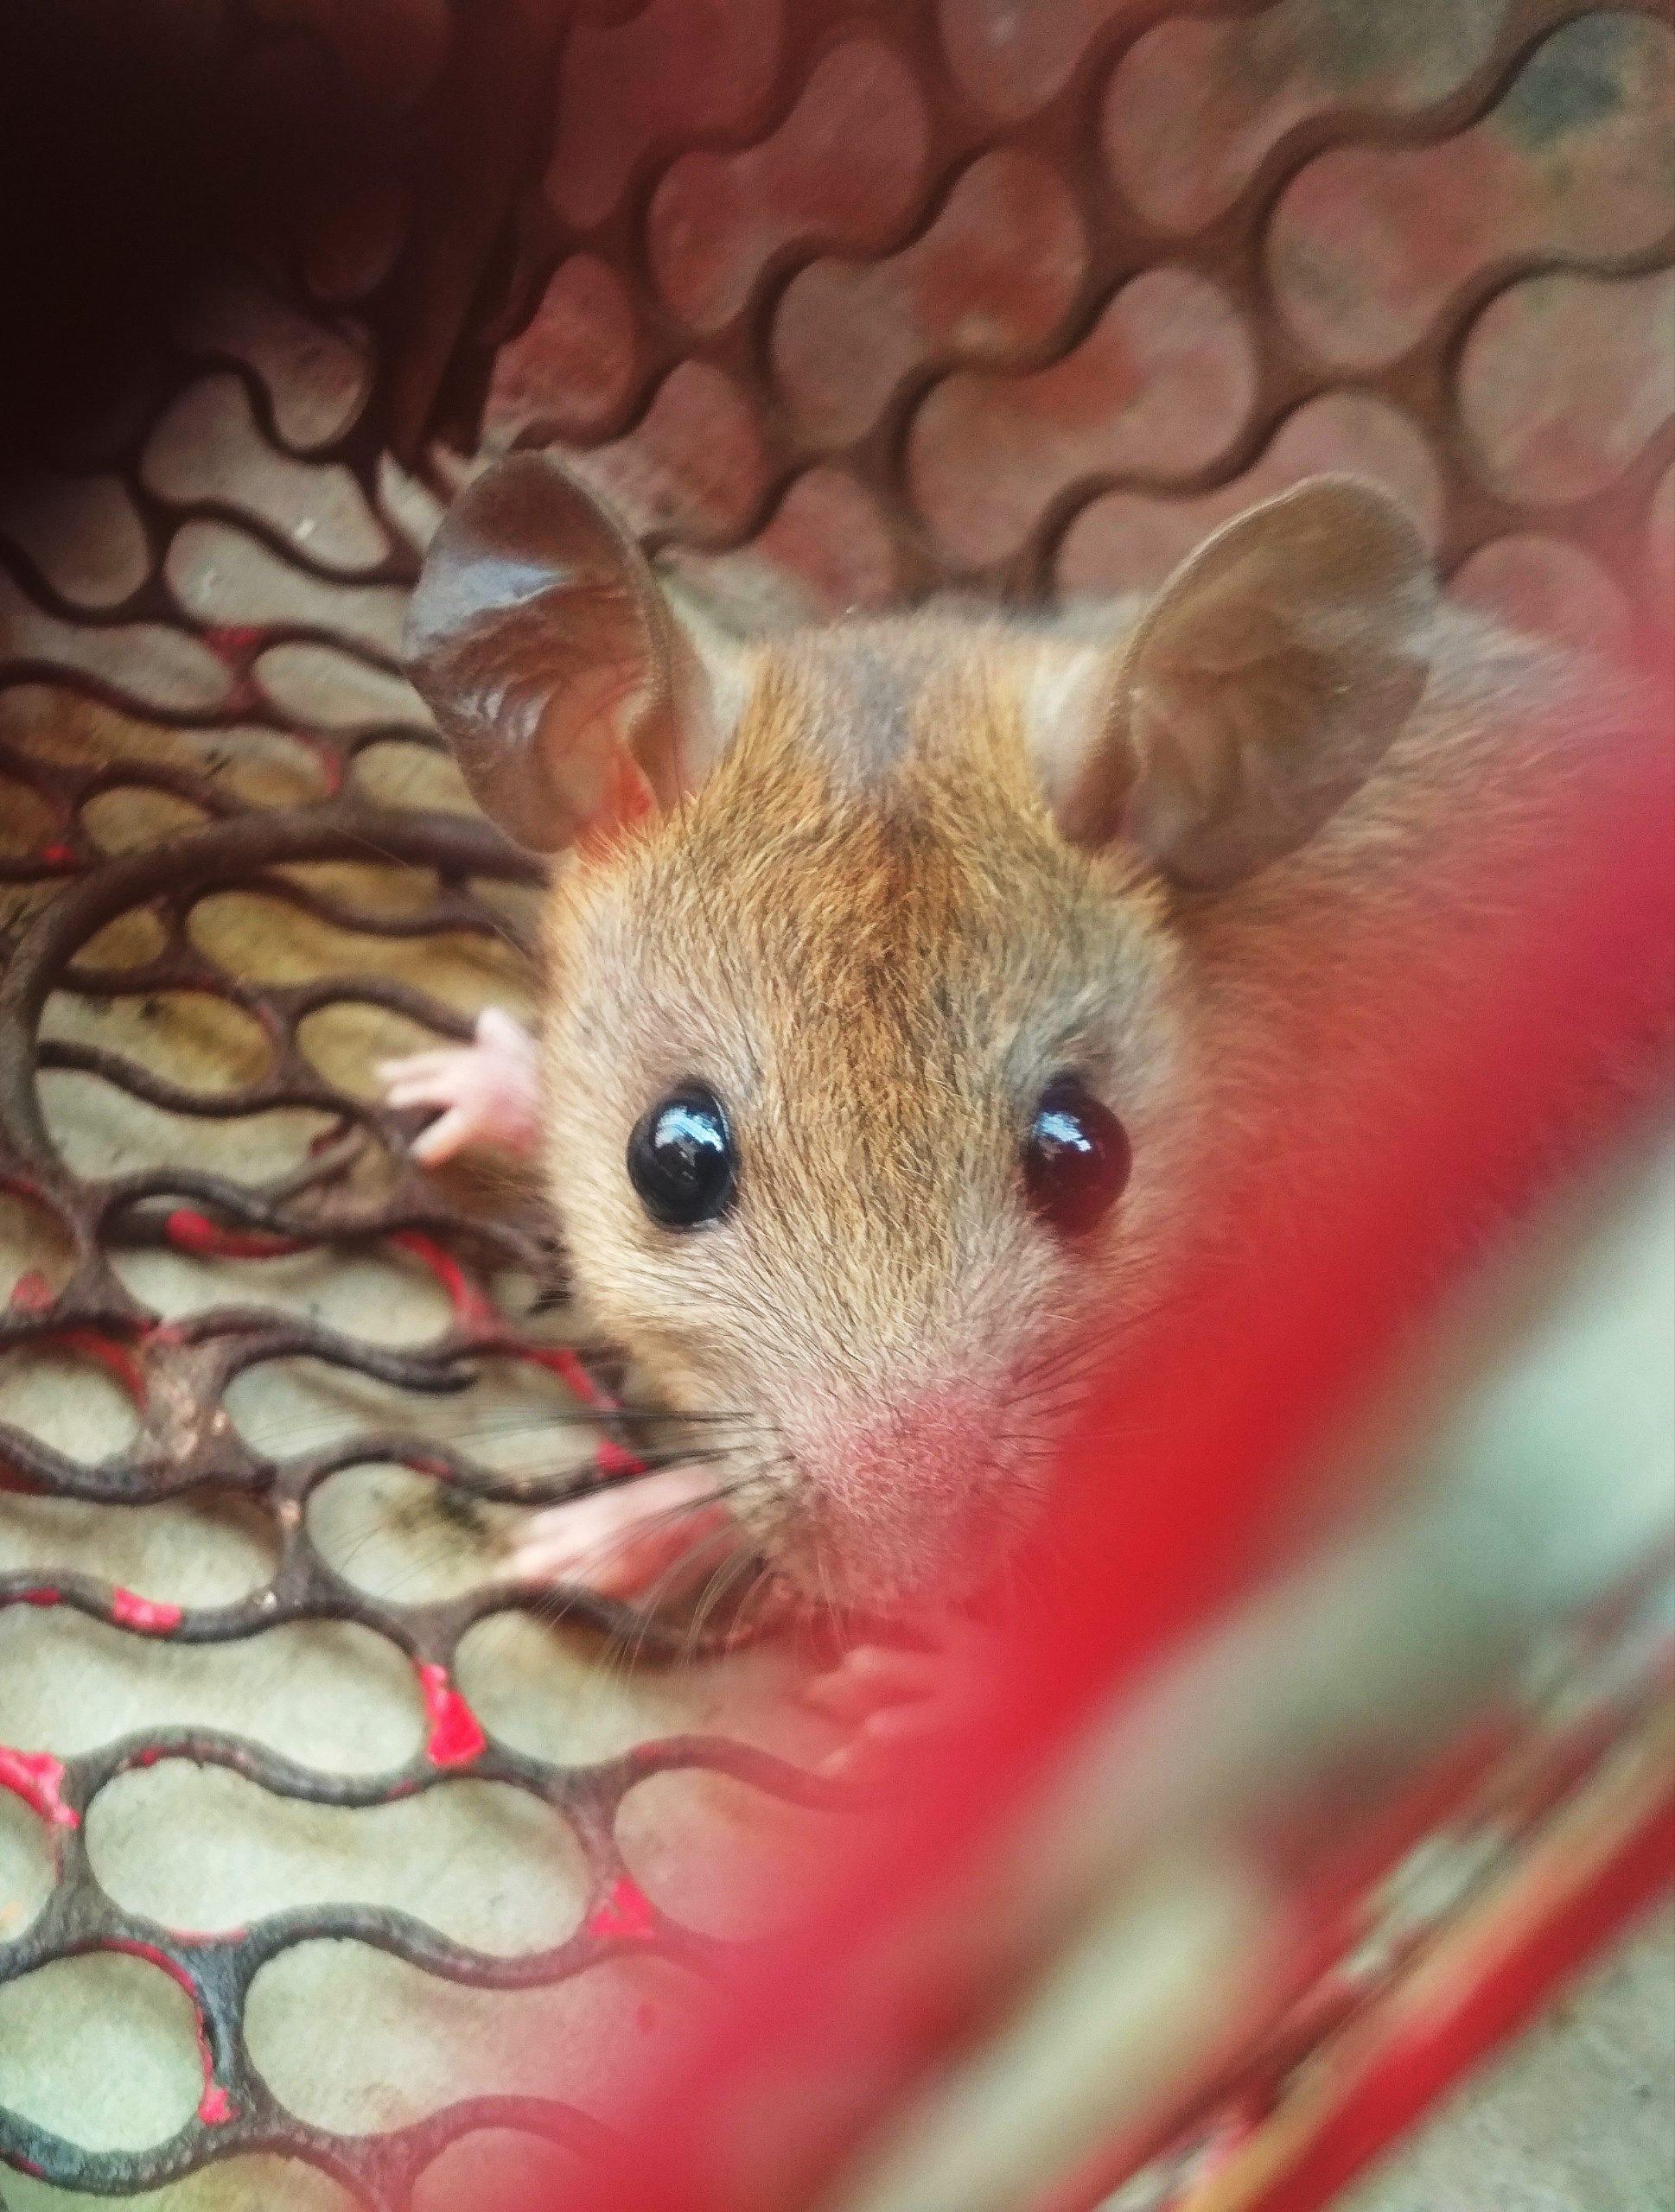 A rat in mousetrap